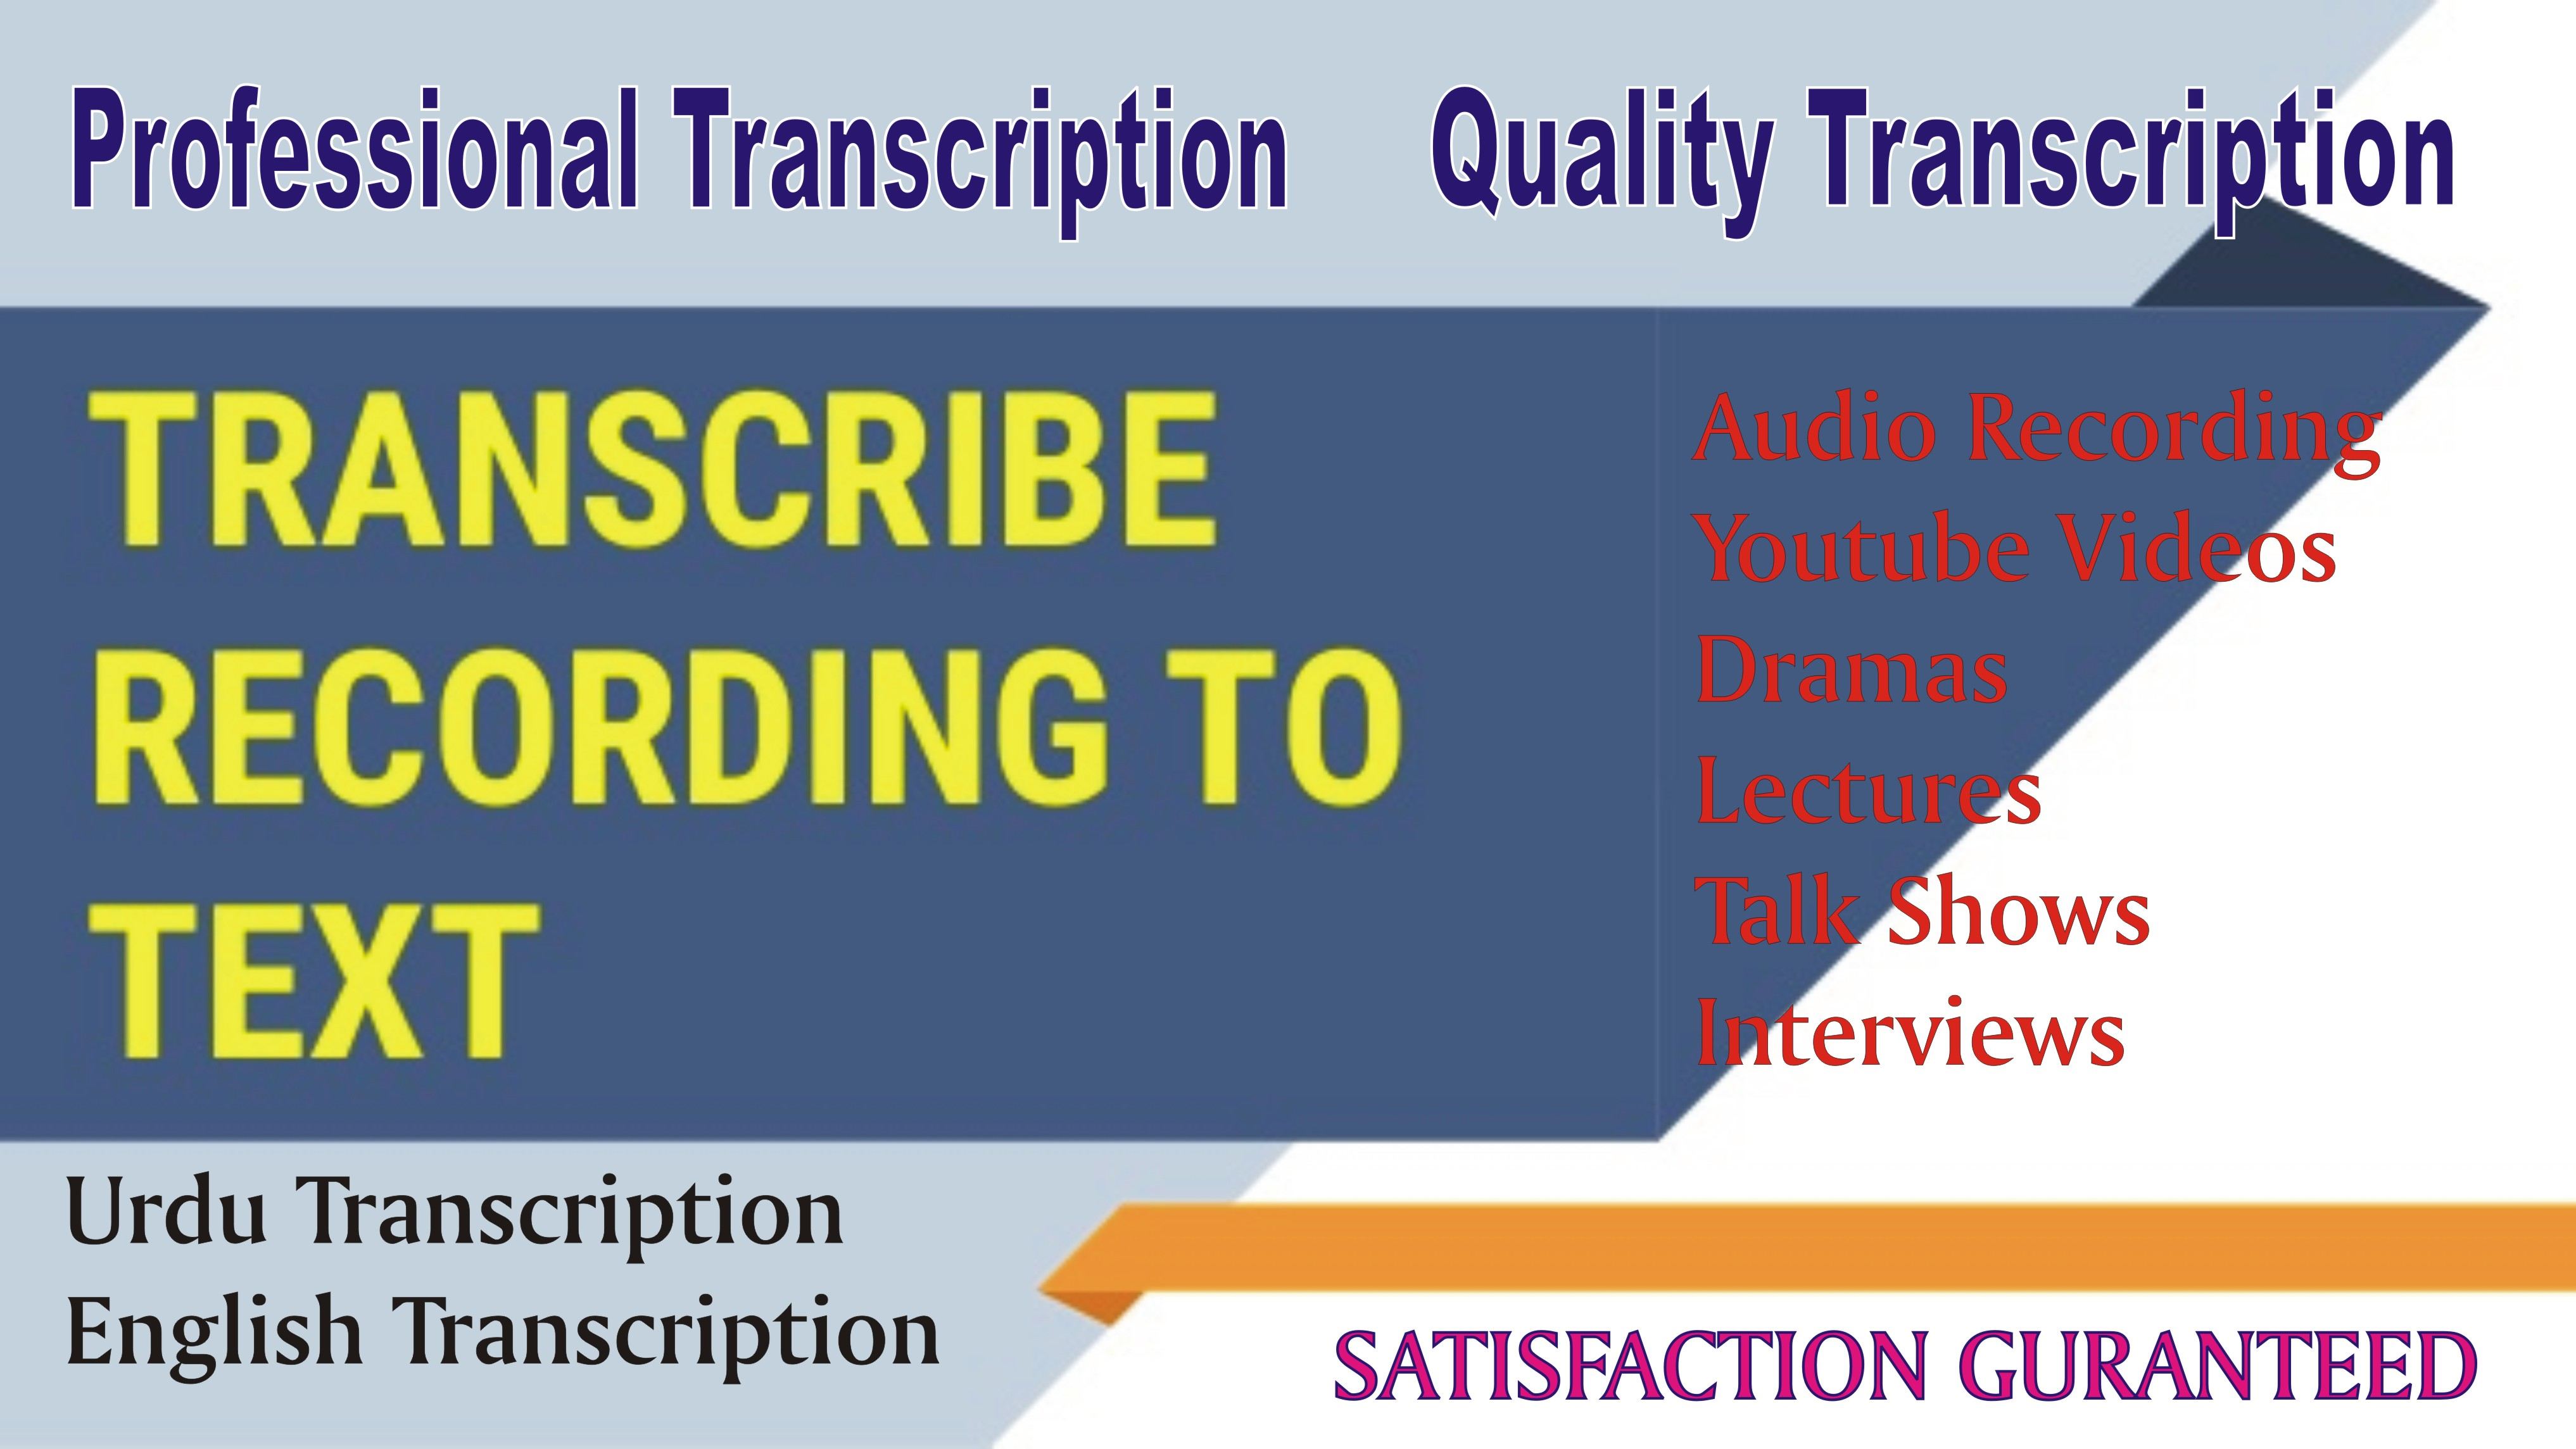 Transcribe Urdu and English Audio/Video